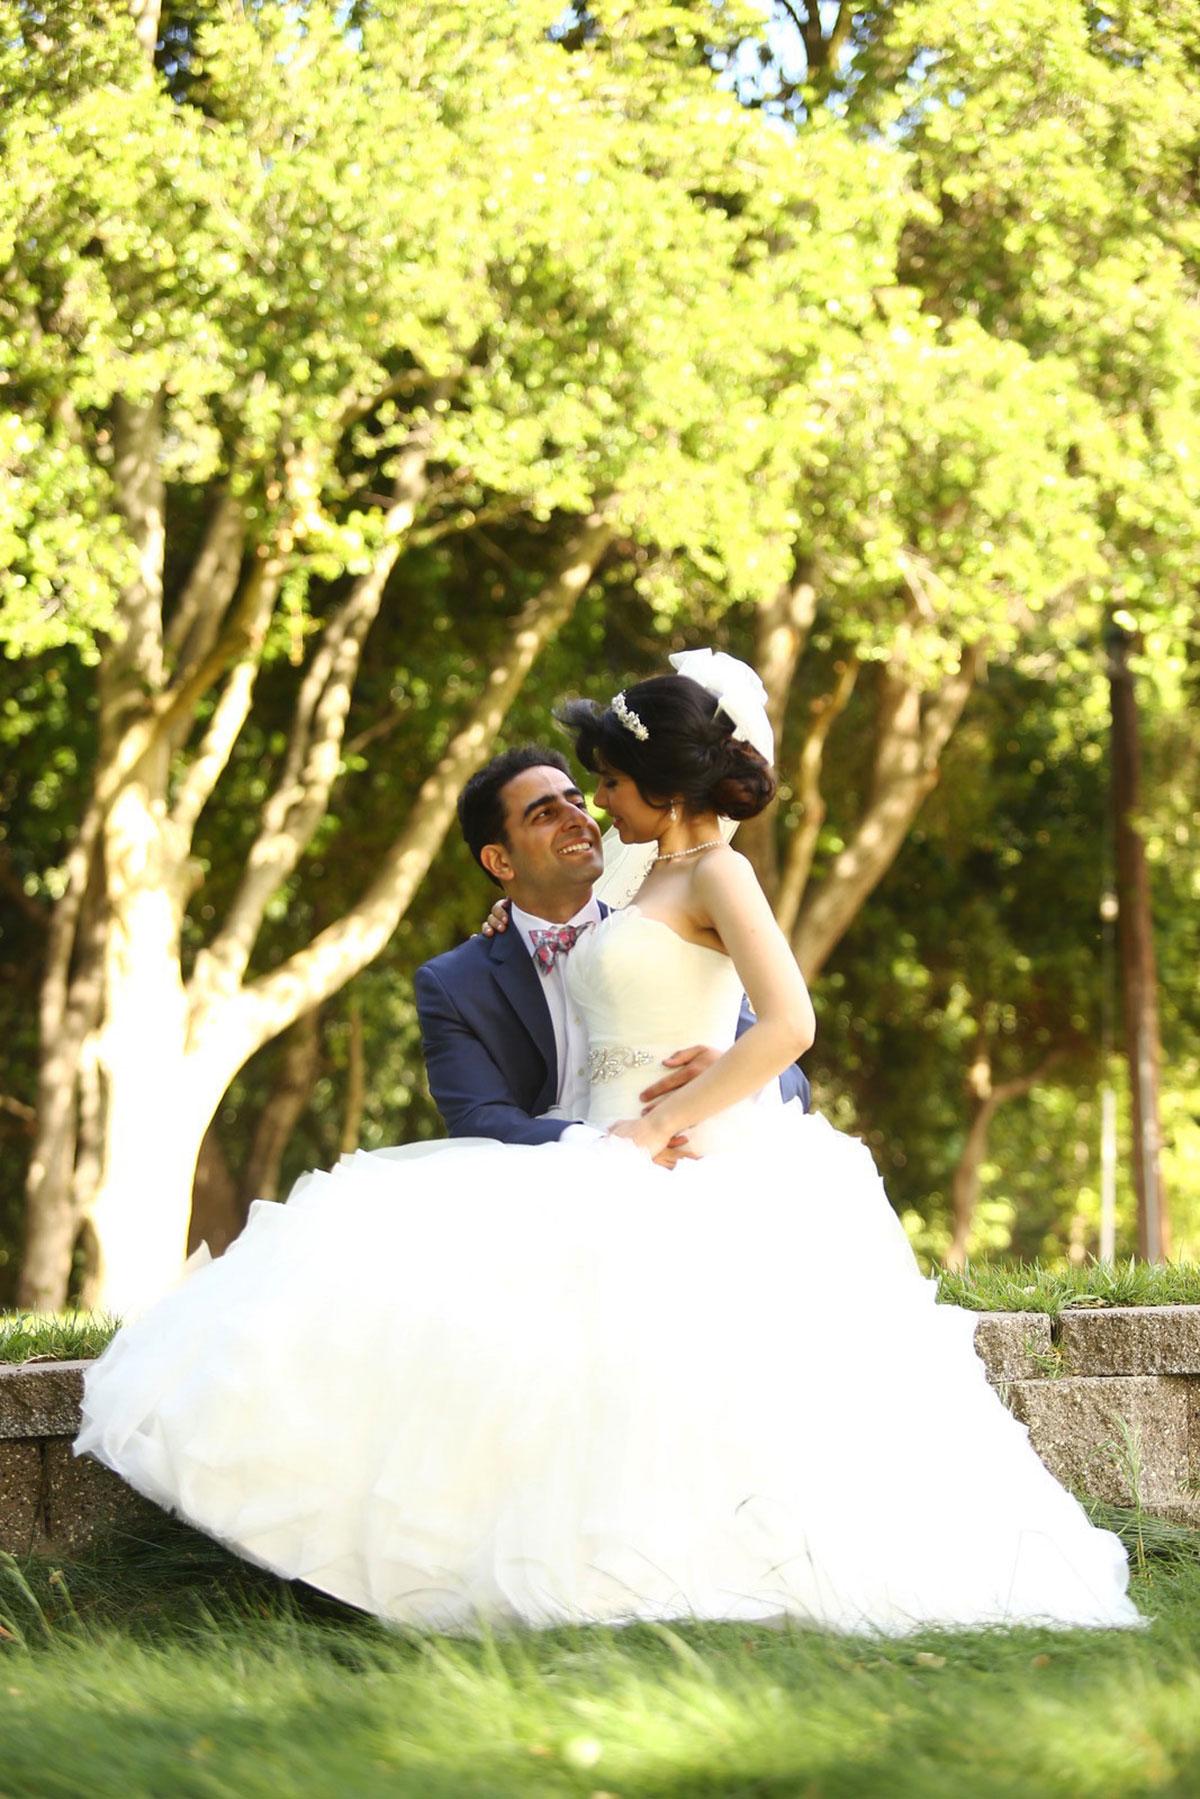 Wedding_Chicago_Iman_Sharareh_013.jpg